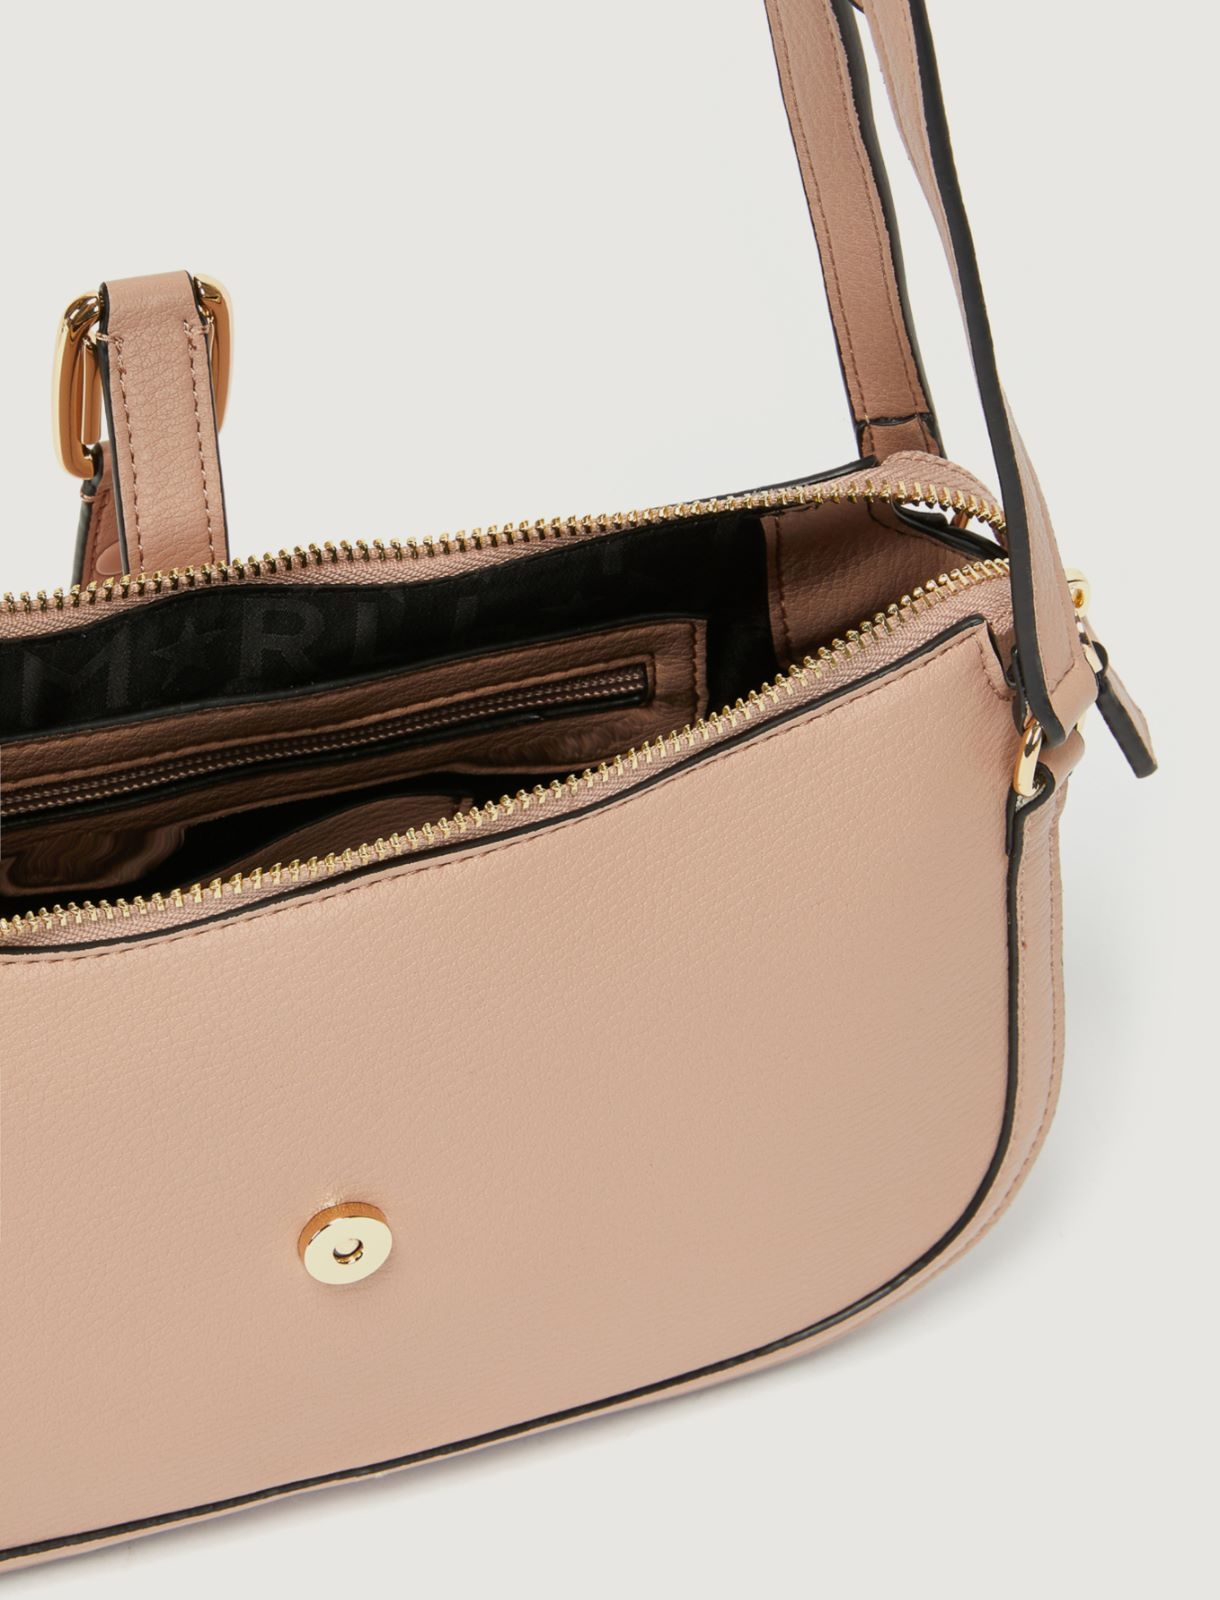 Half-moon bag Marella